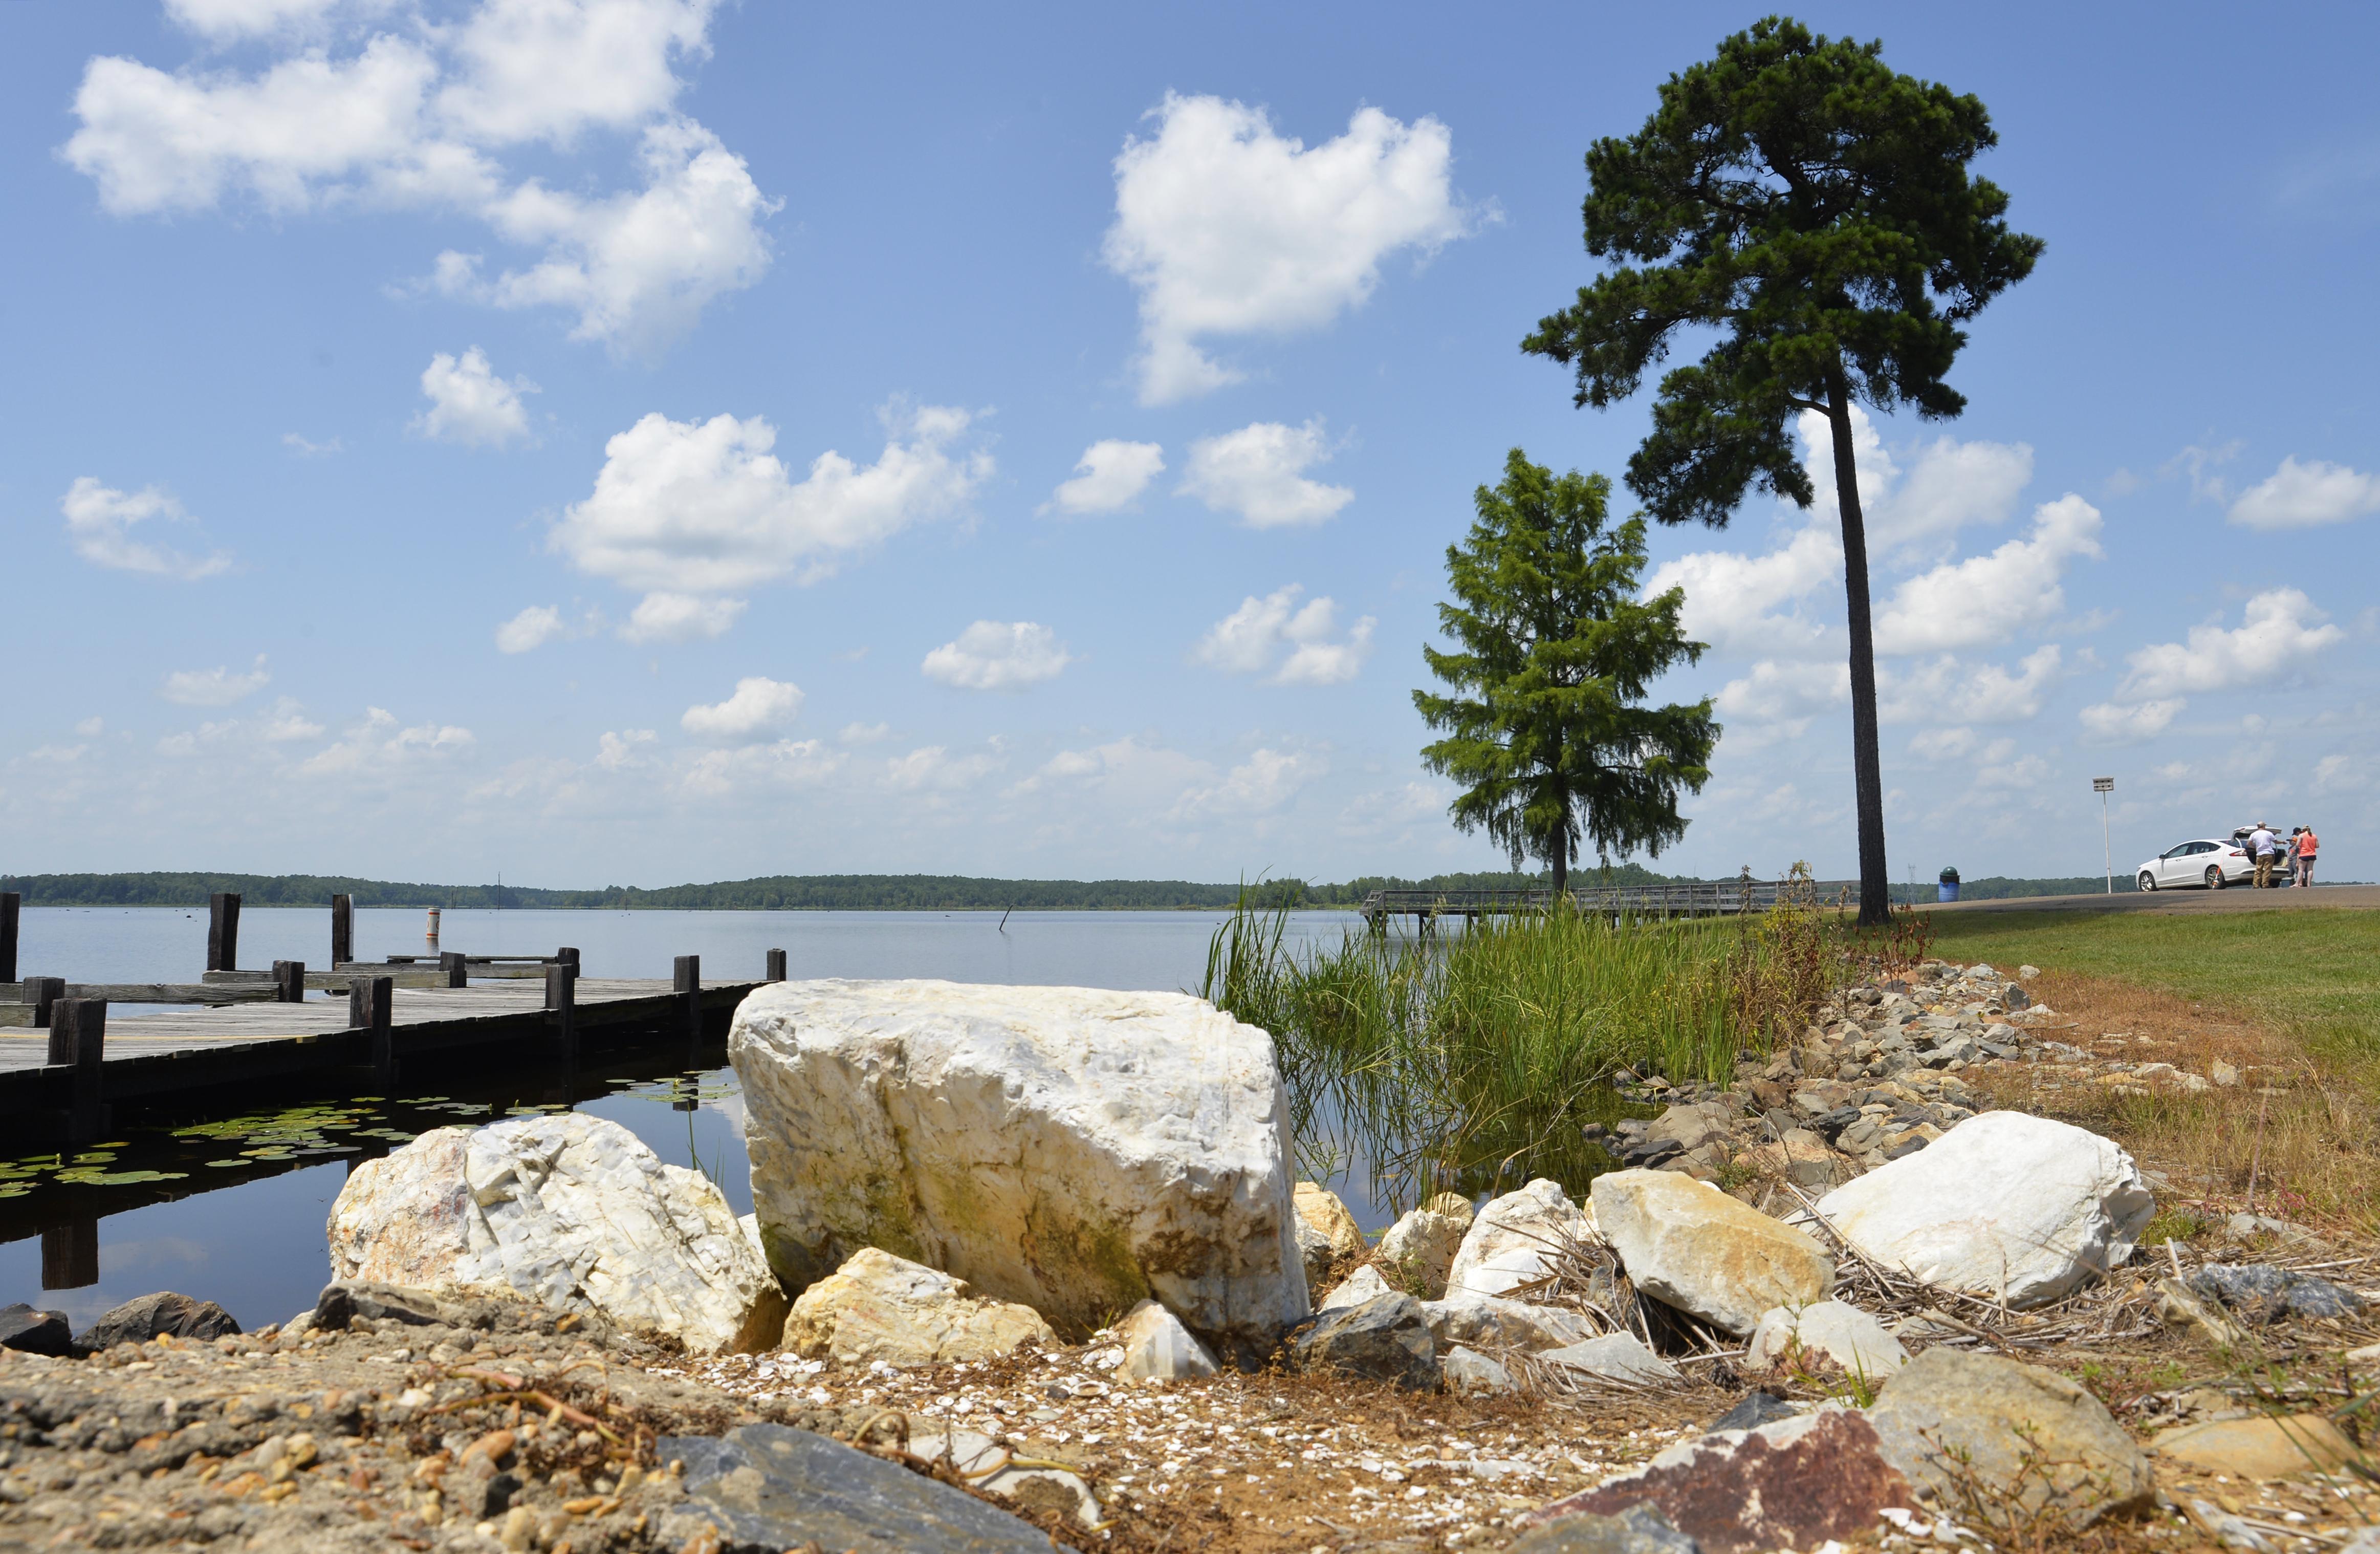 Lake Columbia makes Bassmasters' top 100 fisheries list